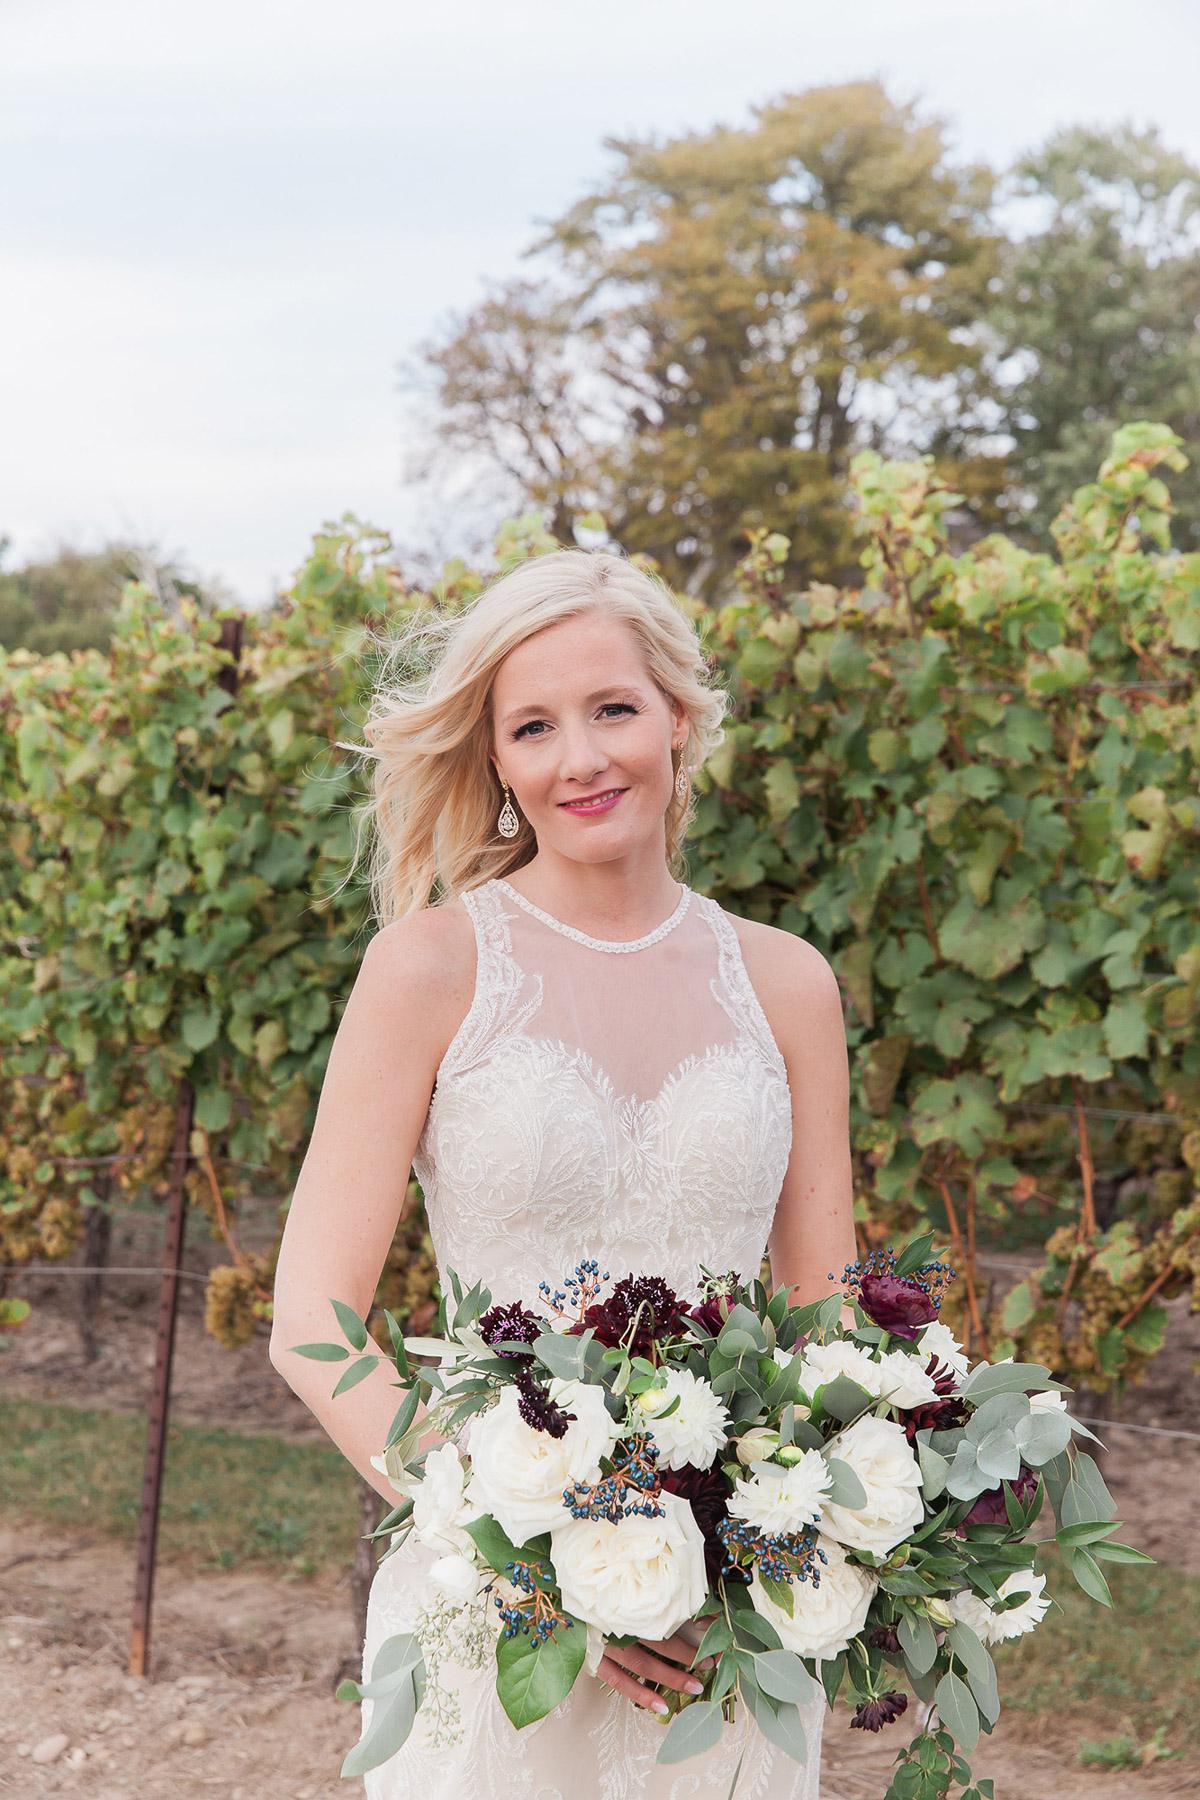 gemini-photography-vineyard-bride-swish-list-honsberger-estates-jordan-wedding-32.jpg